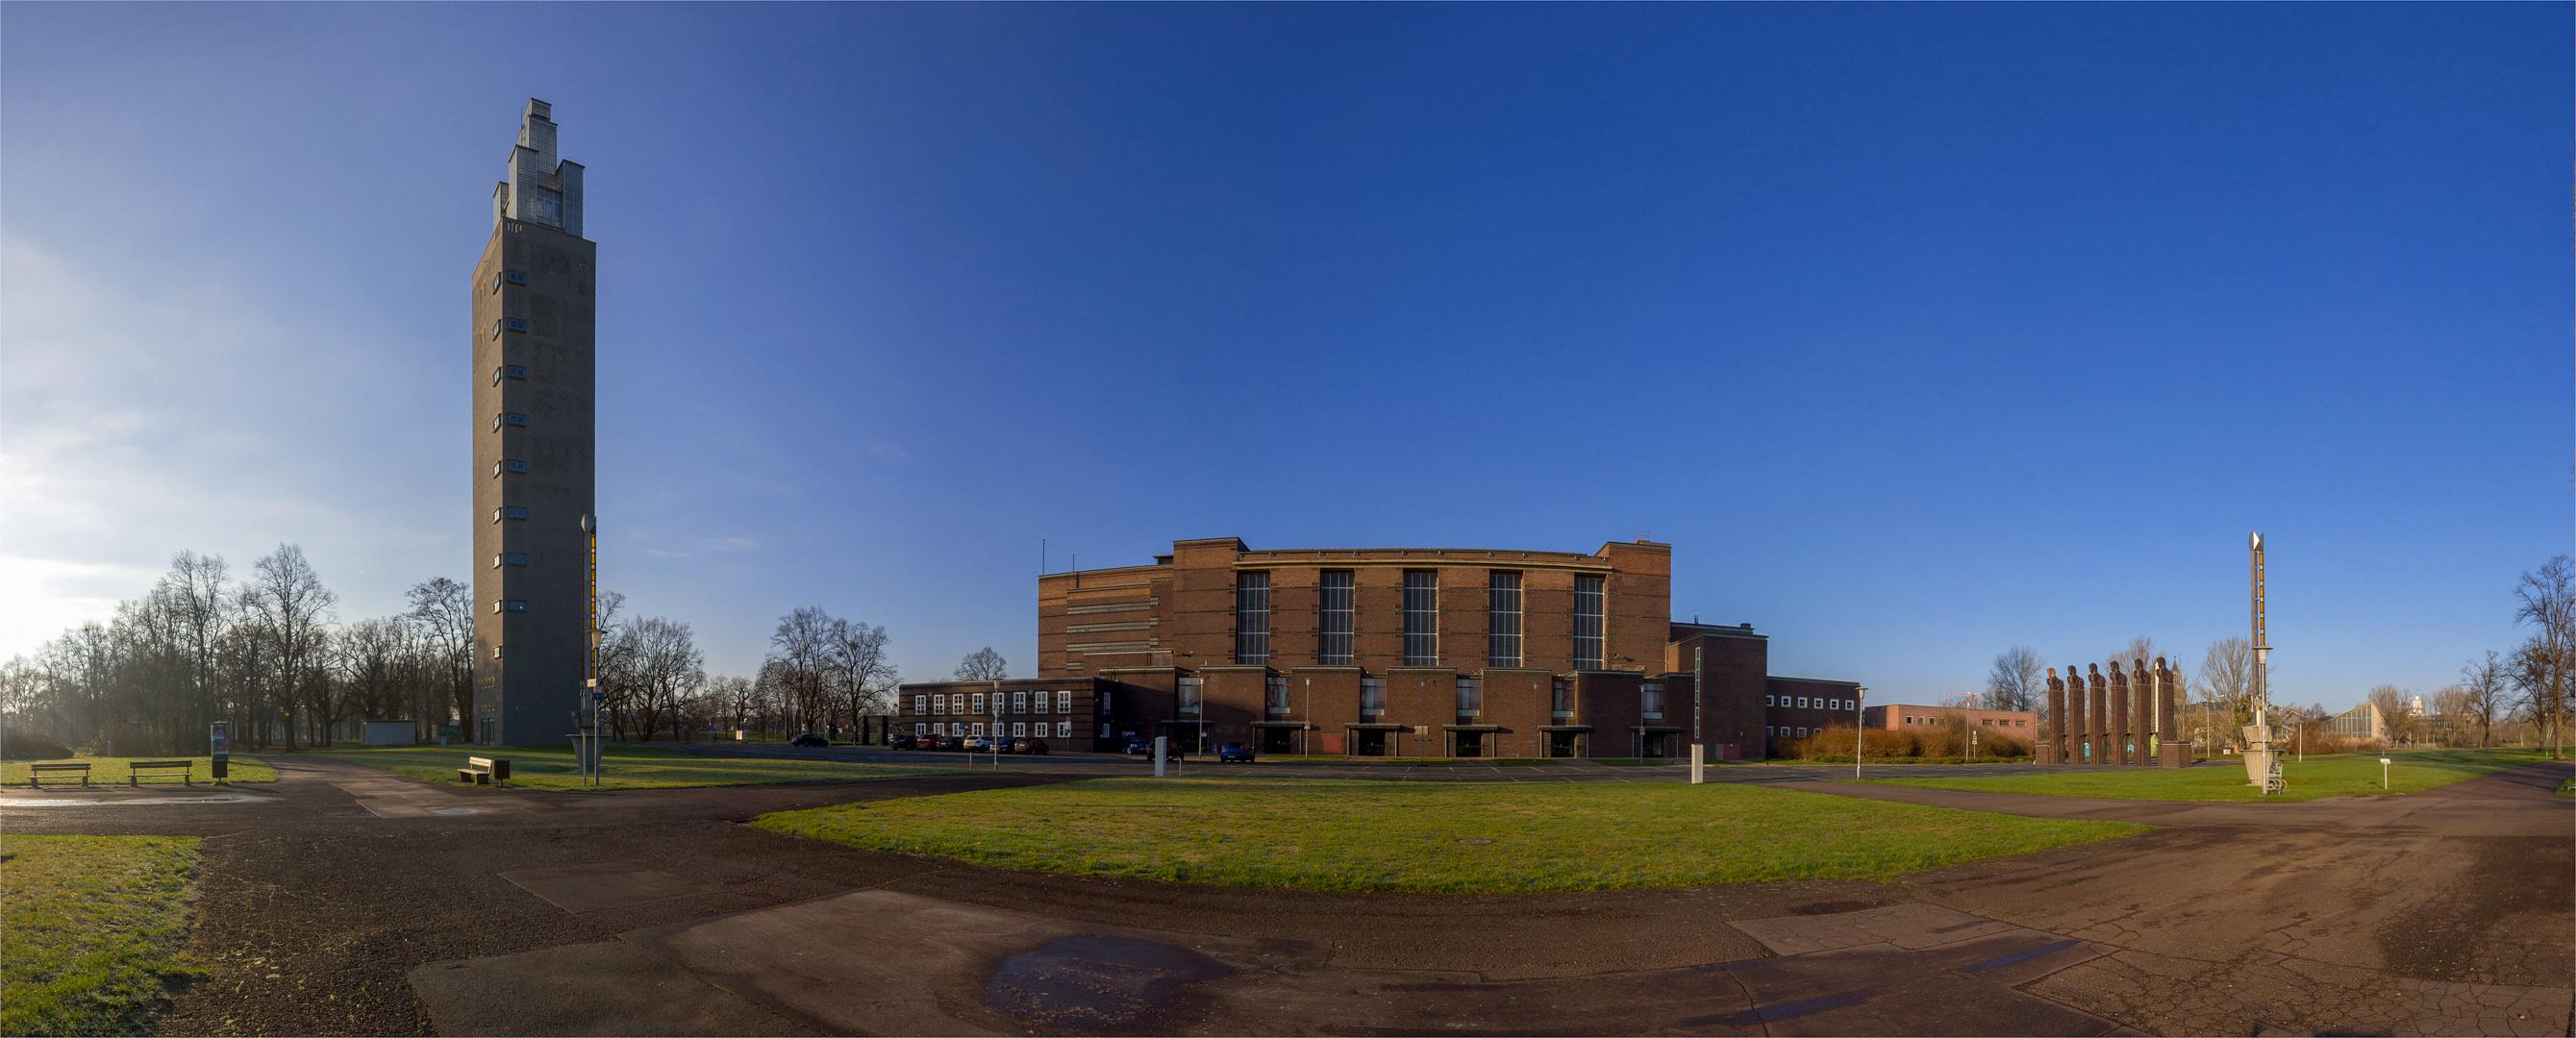 Architektur Magdeburg architekturensemble stadthalle magdeburg foto bild panorama